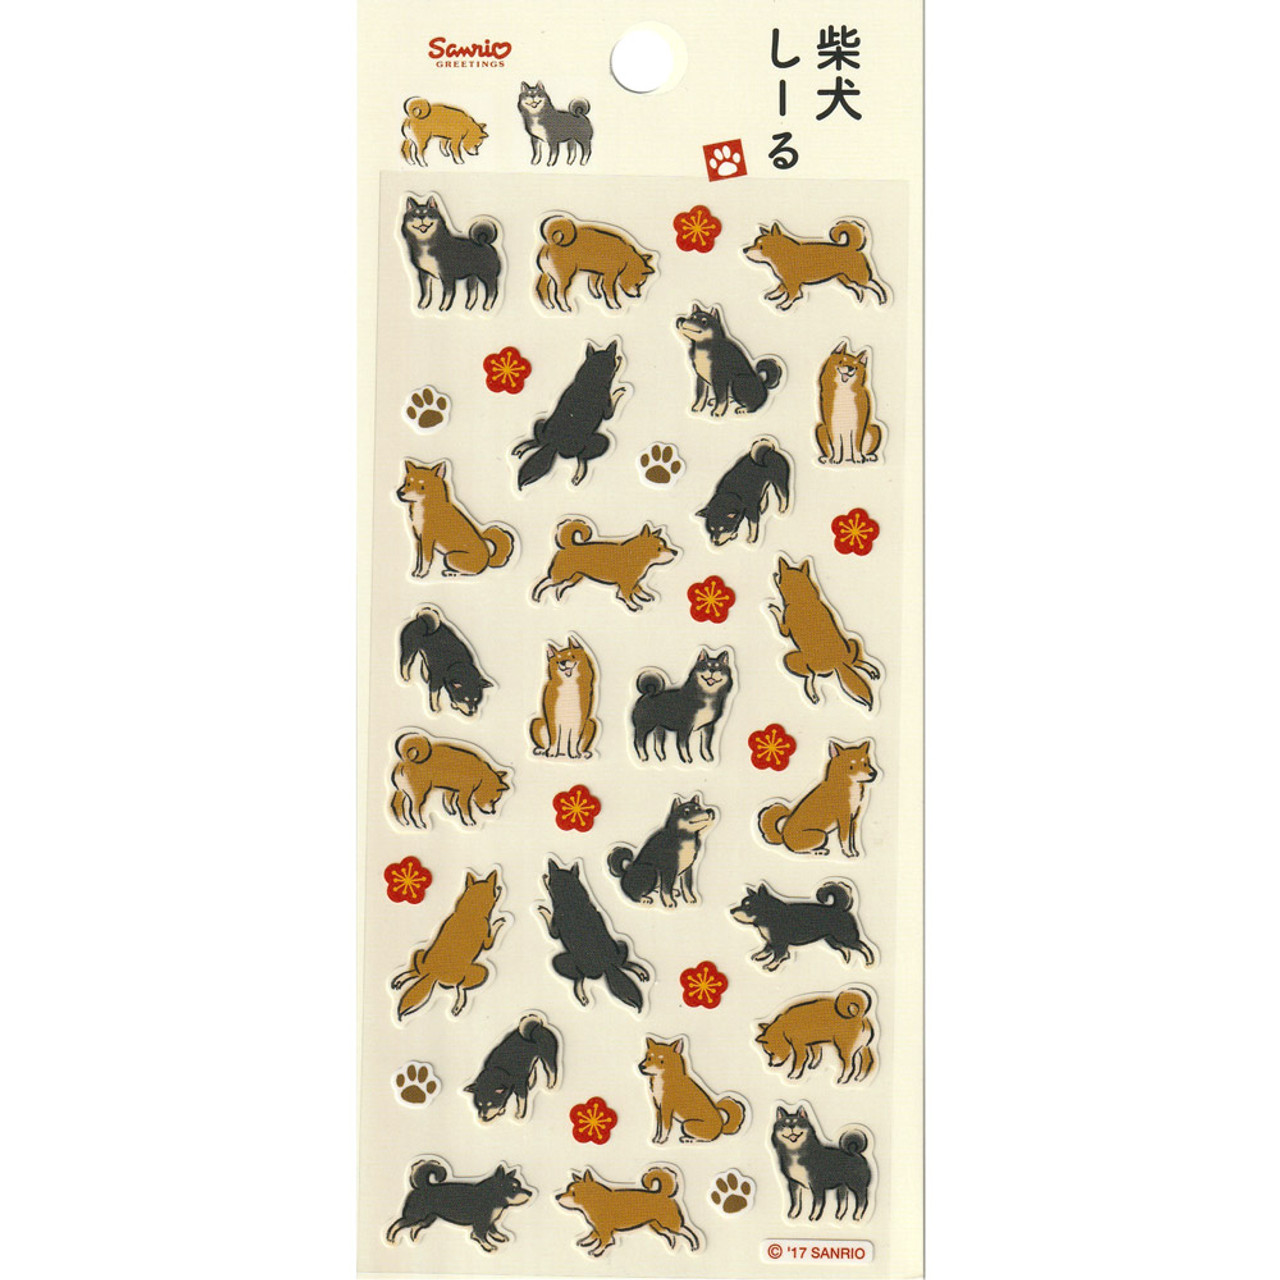 Sanrio Super Cute Shiba Inu Dog New Year's greetings Sticker Sheet ( Front View )